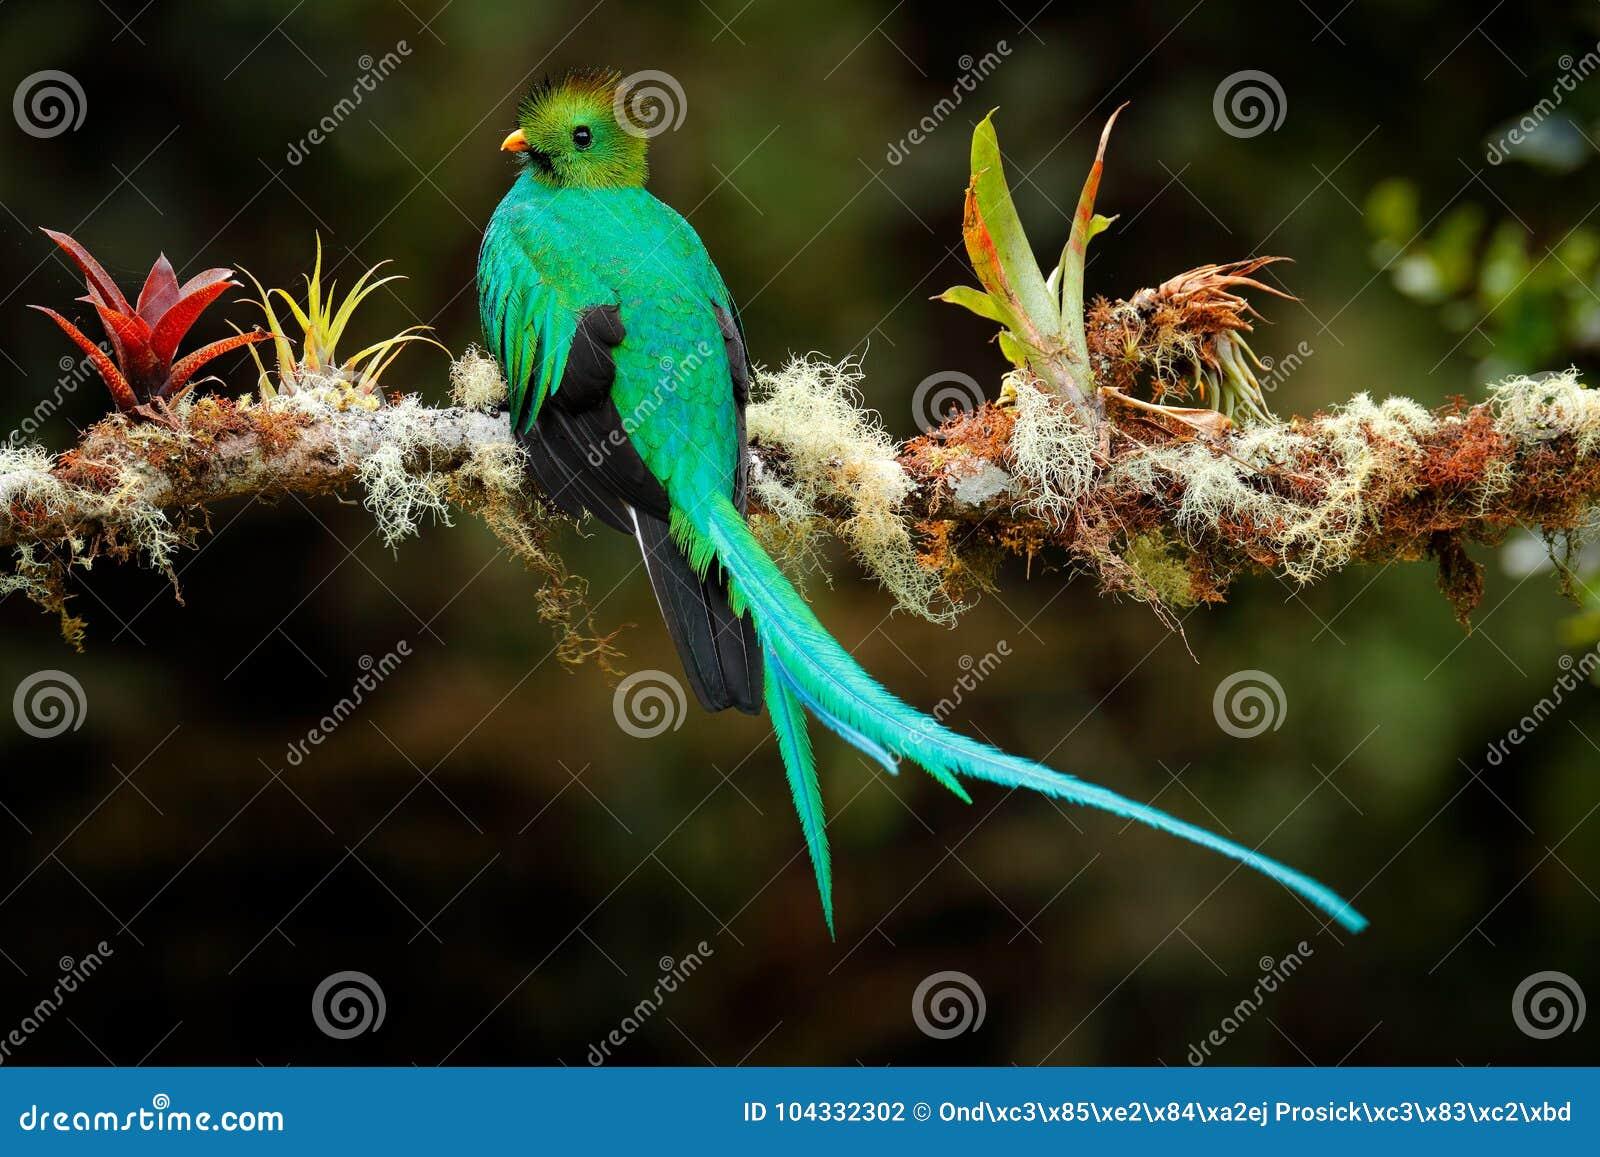 Download 灿烂的格查尔, Pharomachrus Mocinno,从Savegre在有被弄脏的绿色森林前景和背景的哥斯达黎加 Magnifi 库存照片 - 图片 包括有 森林, 薄雾: 104332302